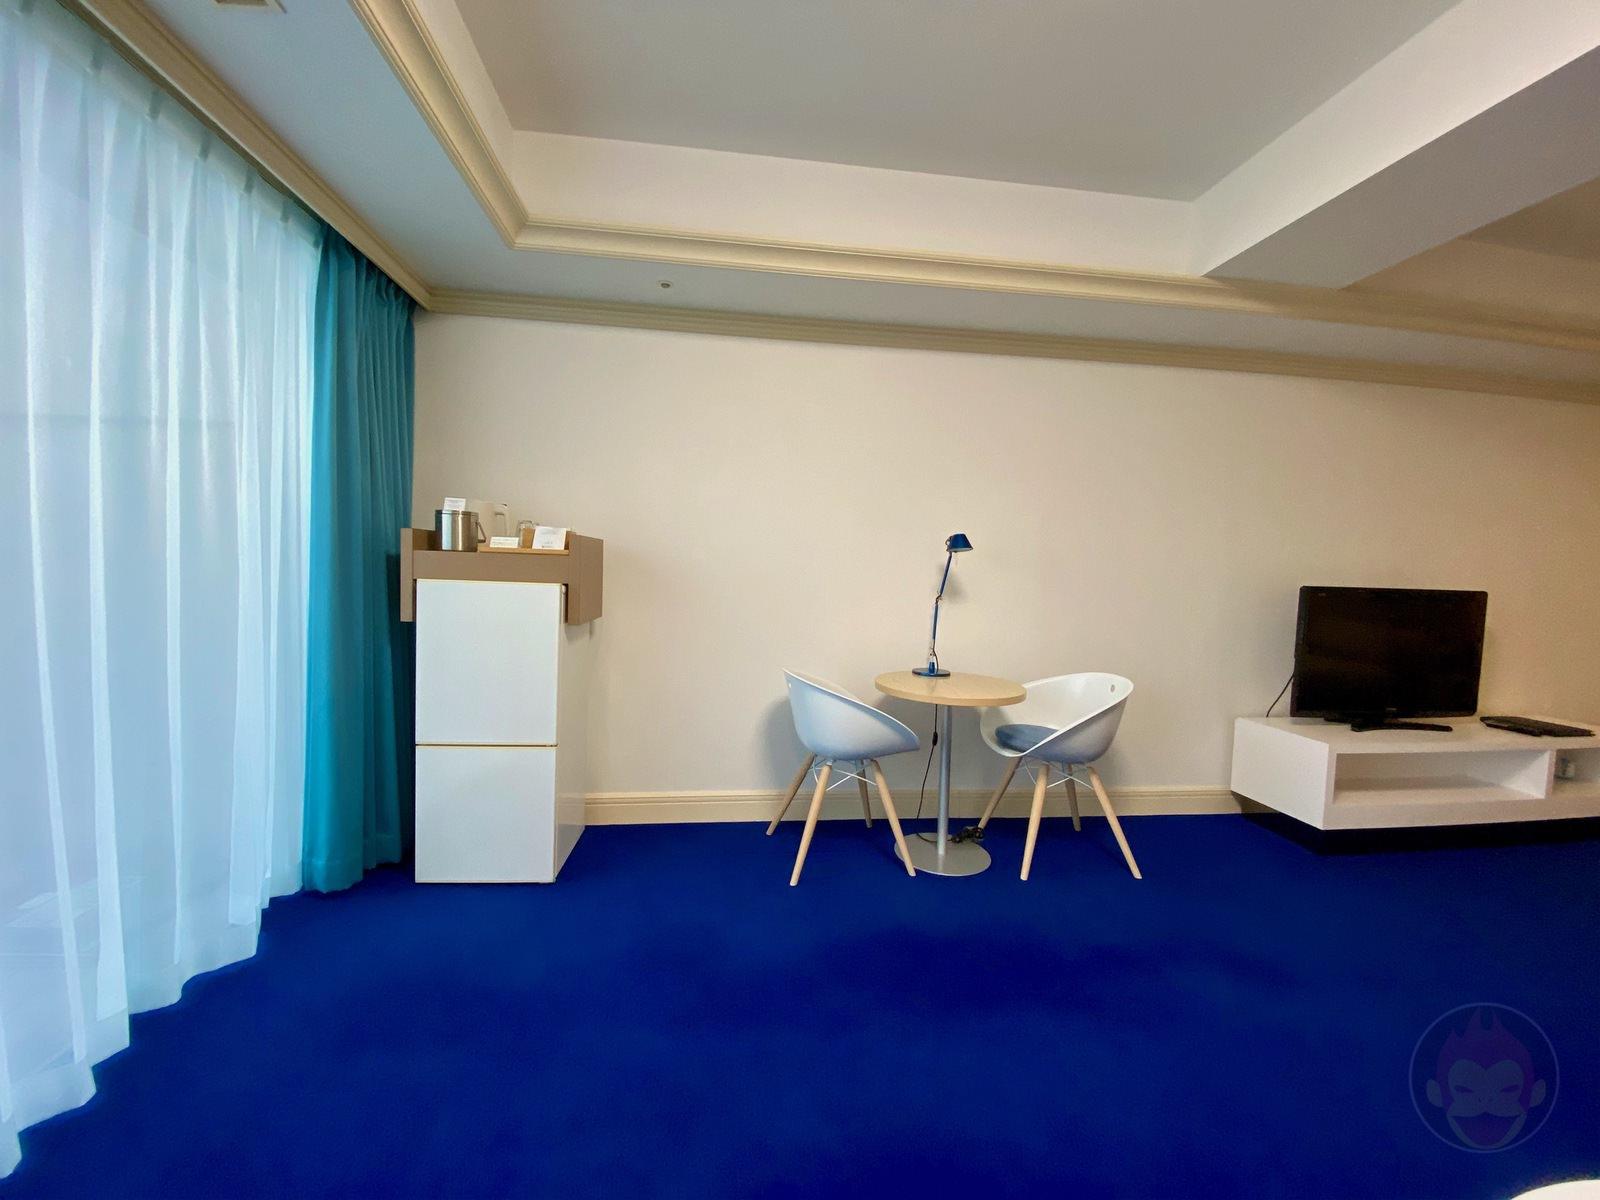 Hoshino Resonale Atami Room 09